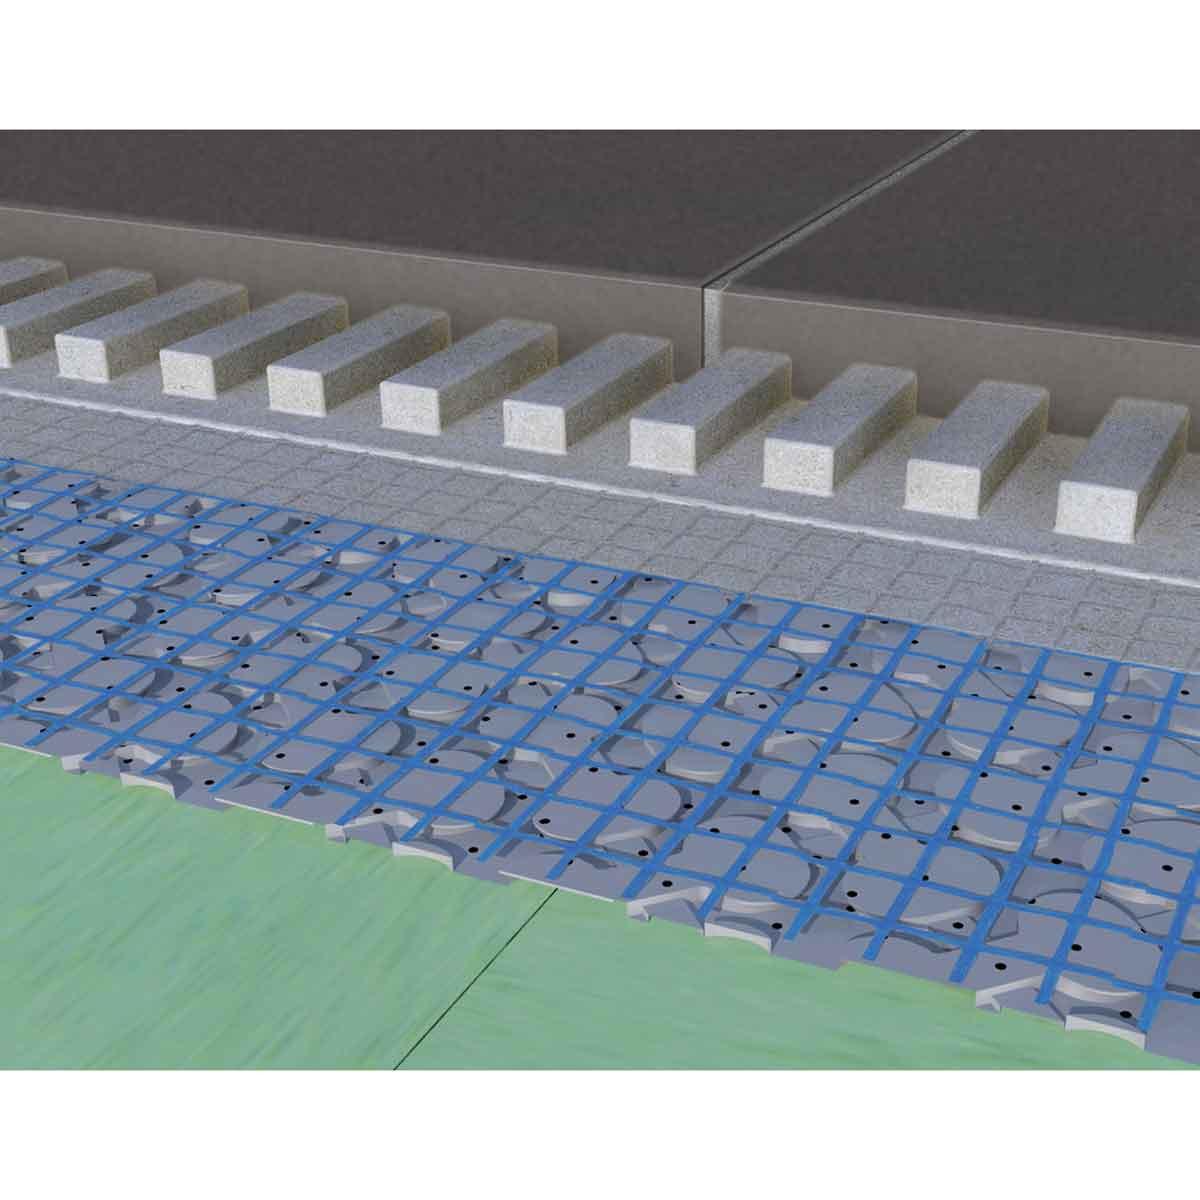 Ardex UI 720 Flexbone Membrane Tile Installation